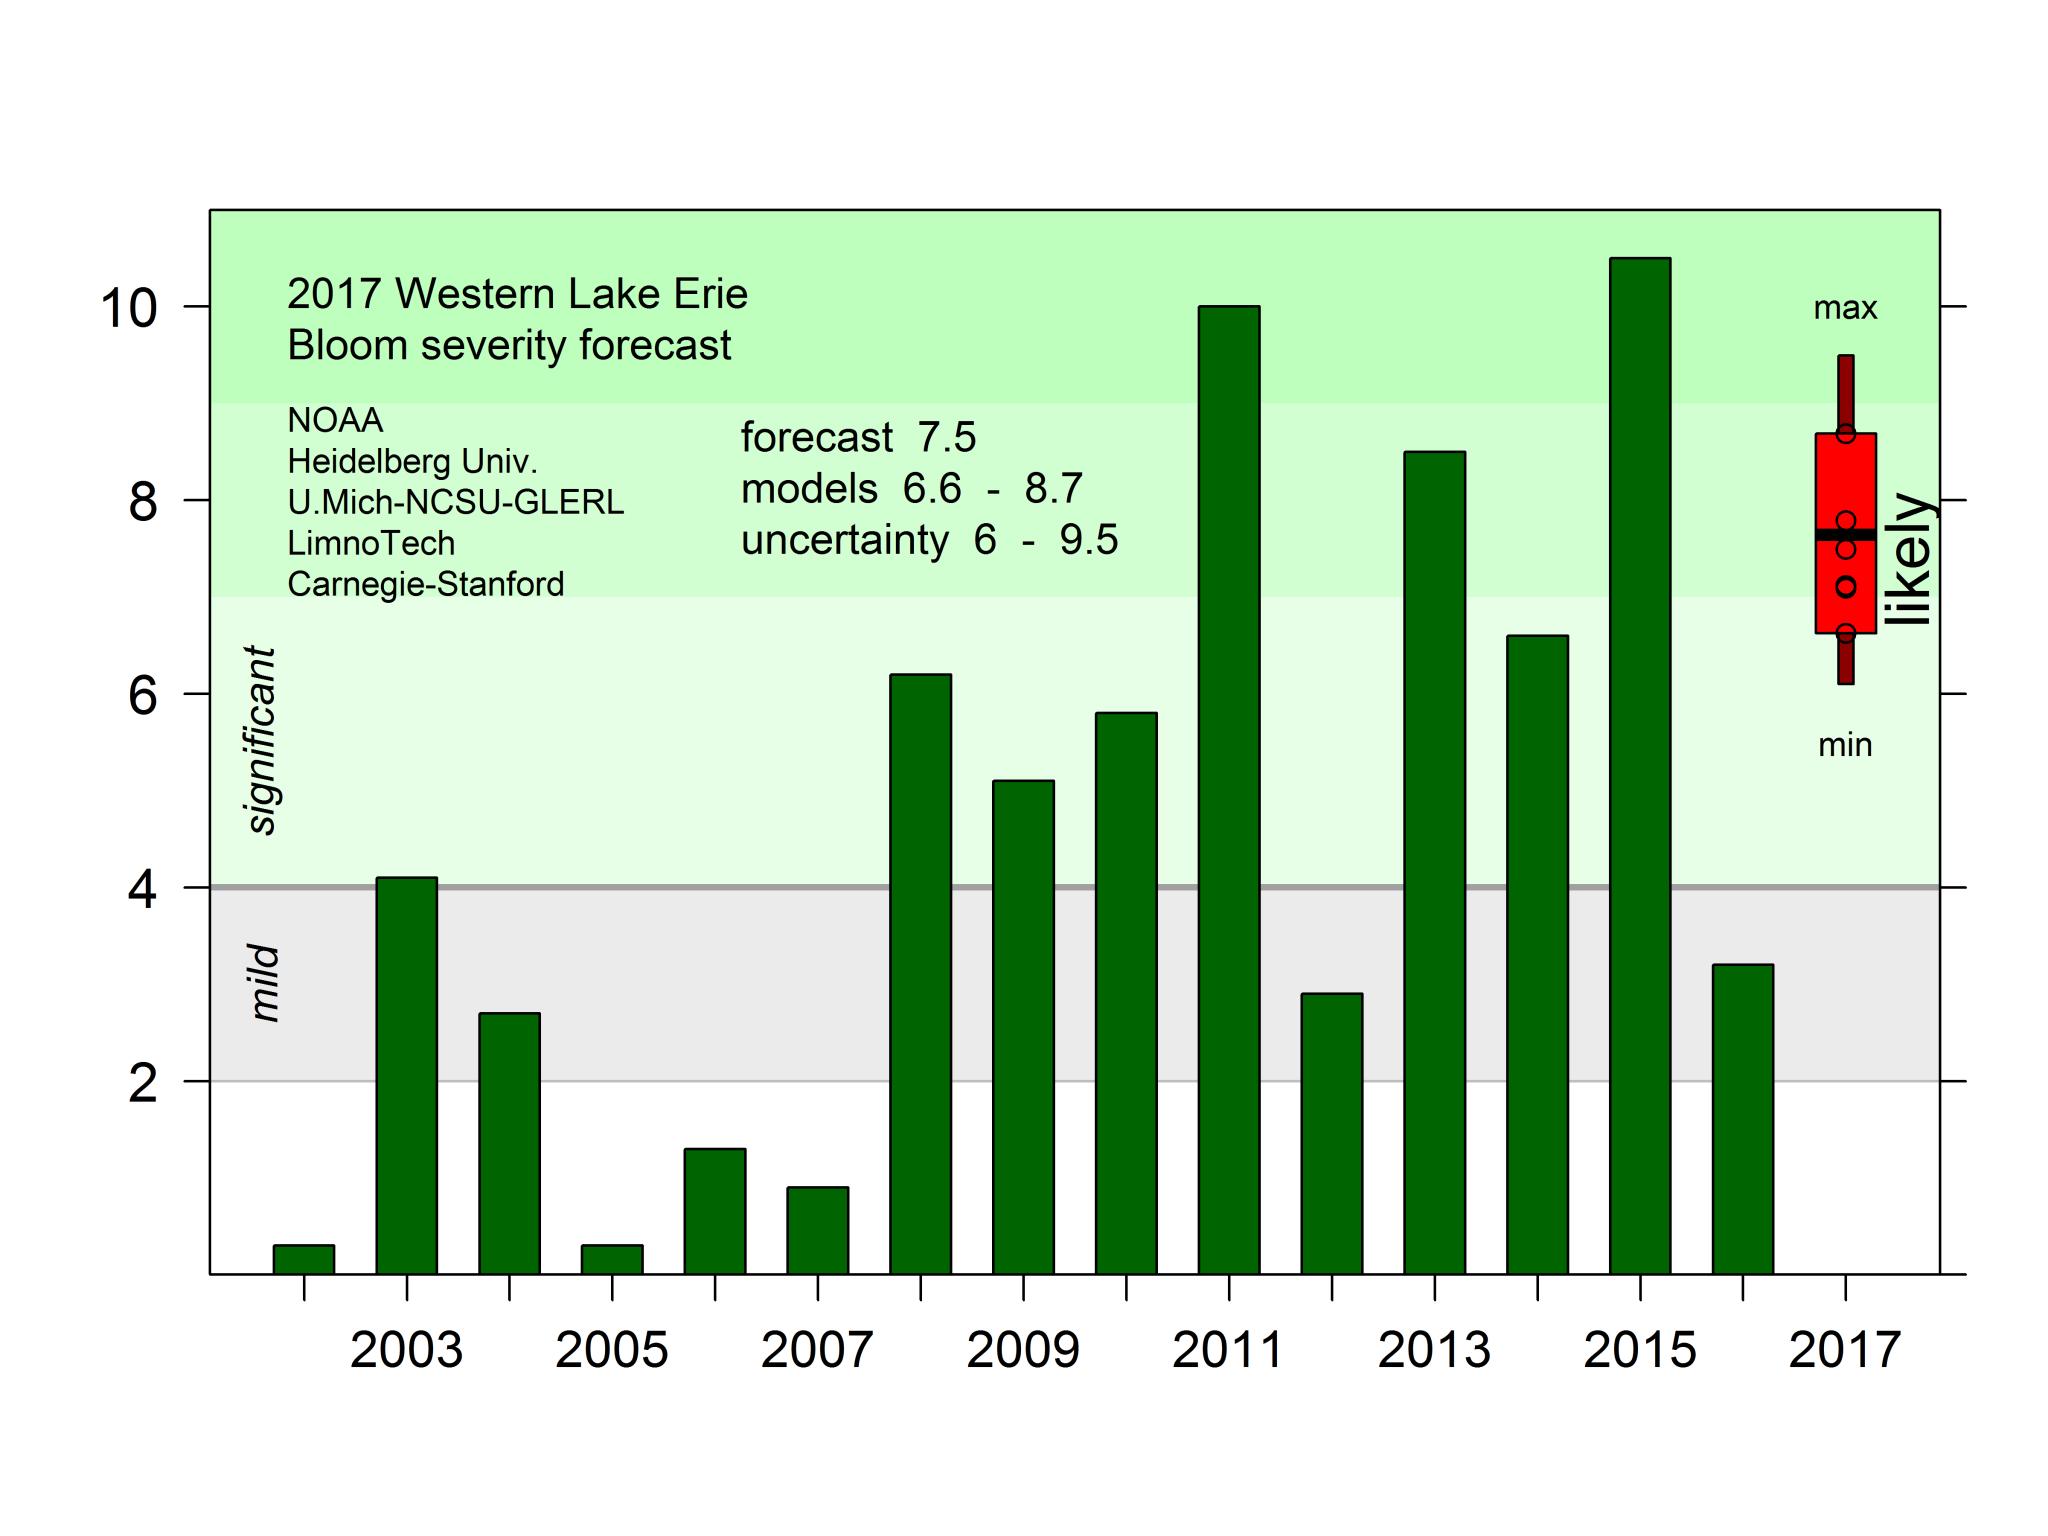 2017 western Lake Erie bloom severity forecast